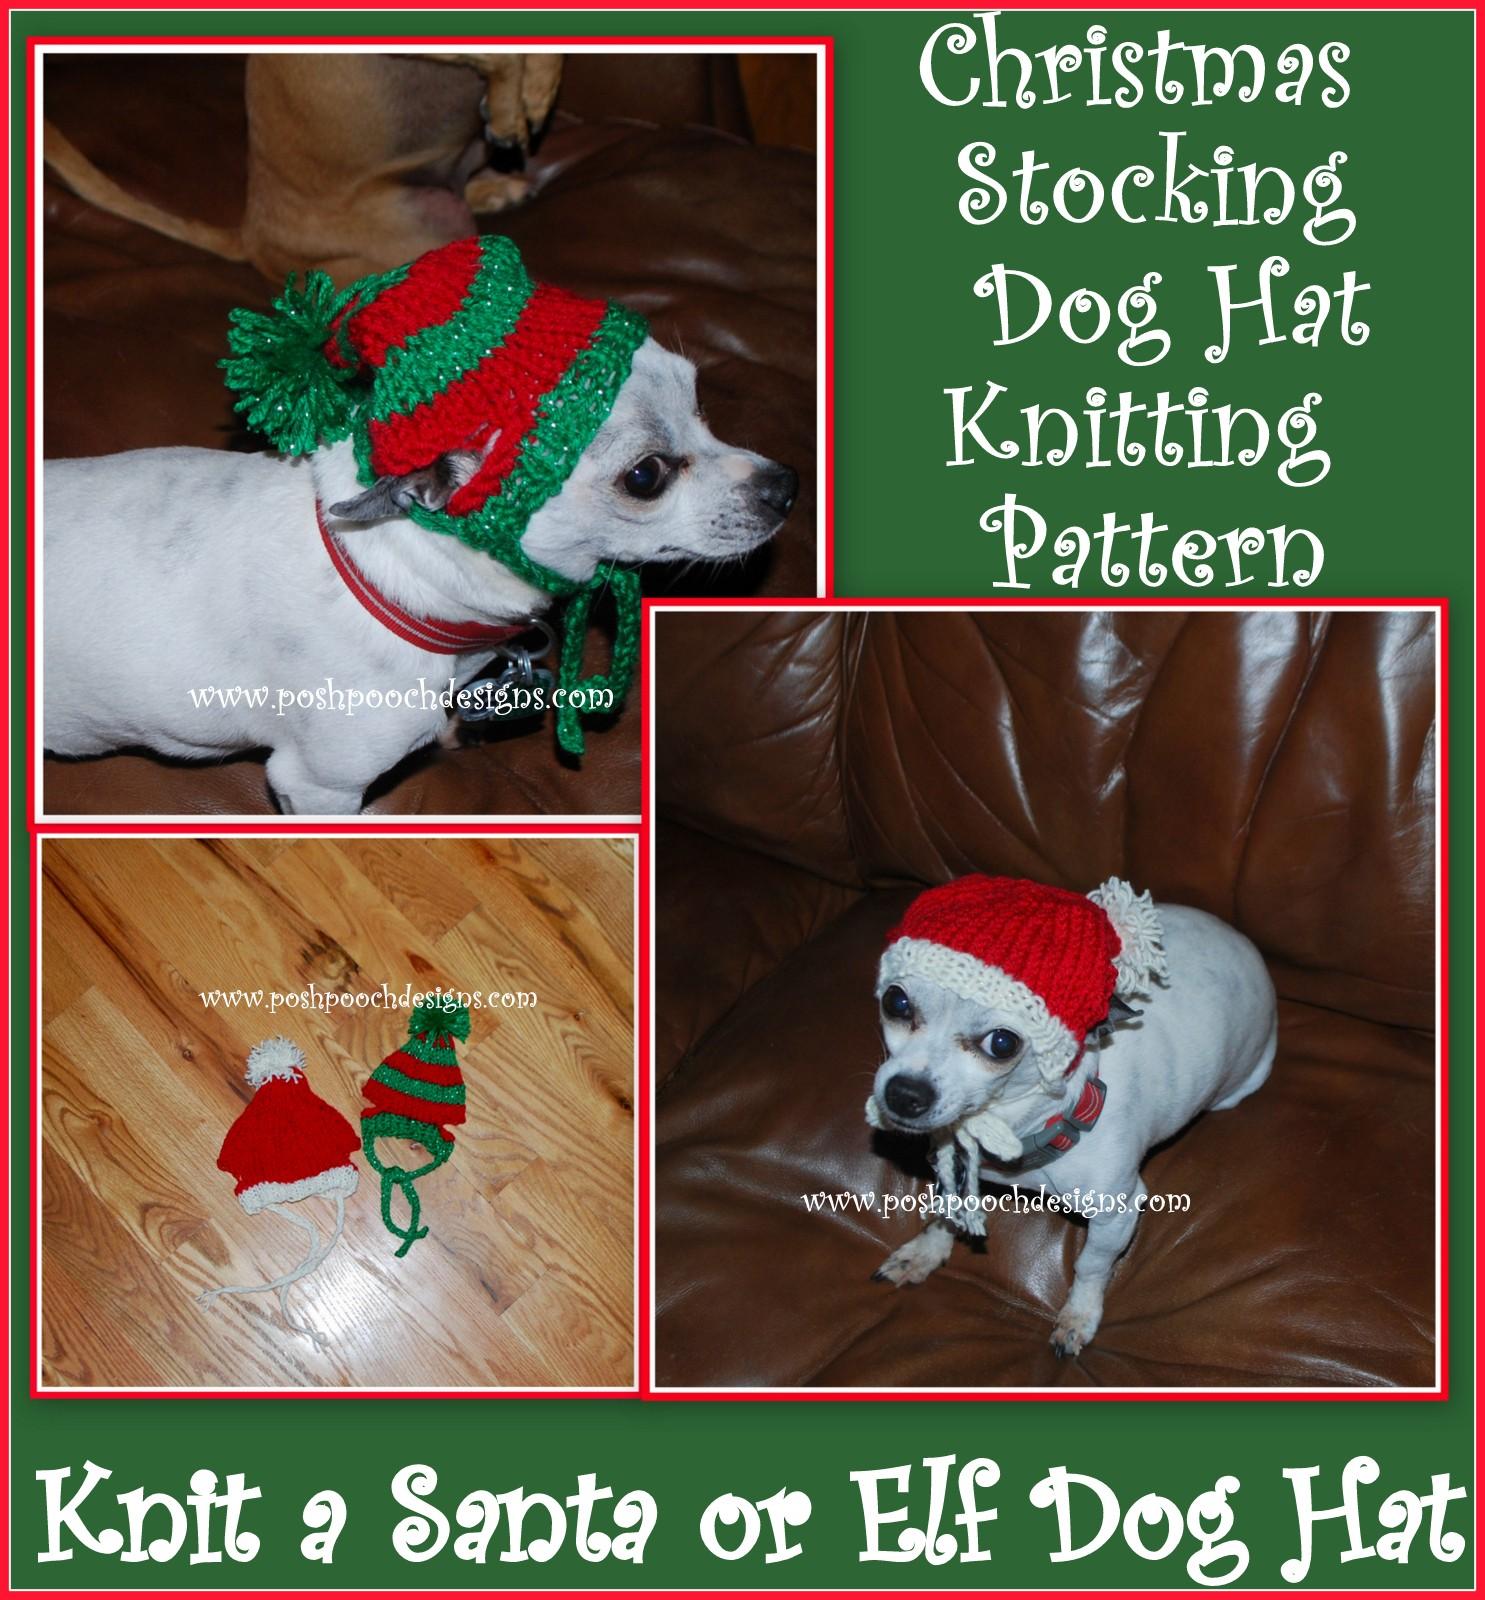 Posh pooch designs dog clothes dog hat knitting patterns - Dog hat knitting pattern free ...